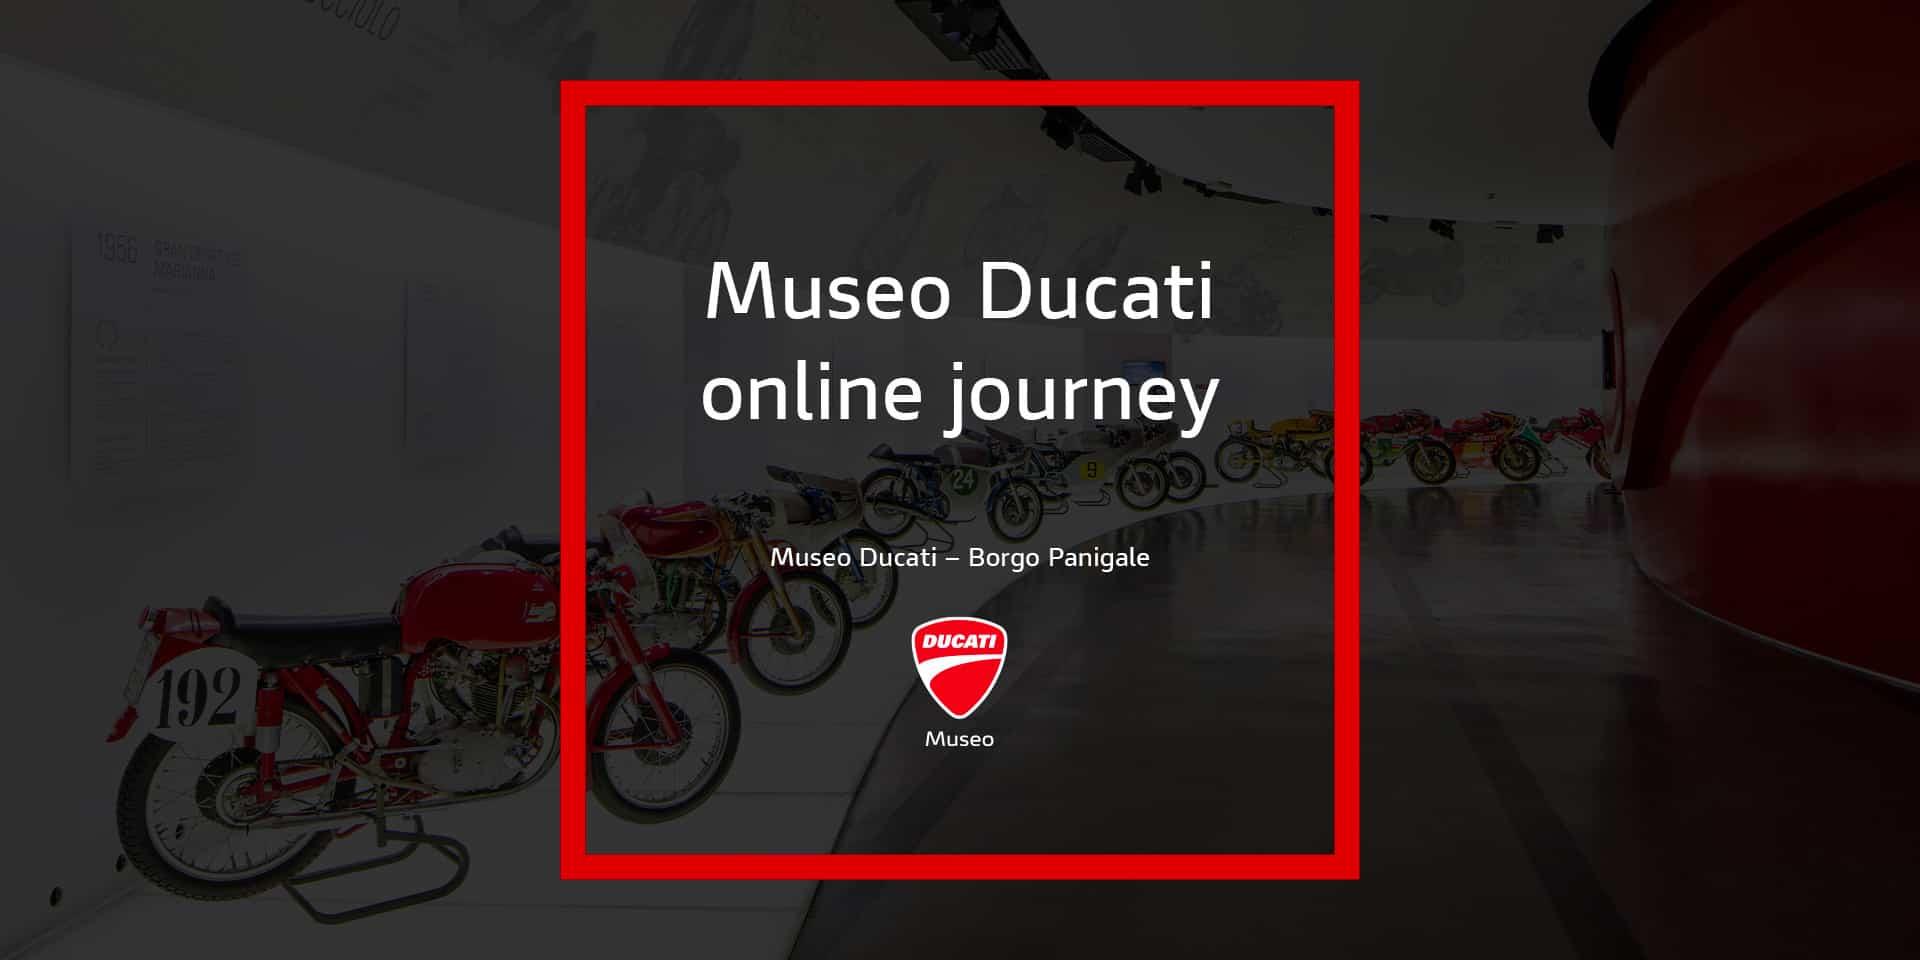 Ducati オンラインツアー「ドゥカティ・ミュージアム・オンライン・ジャーニー」を開始